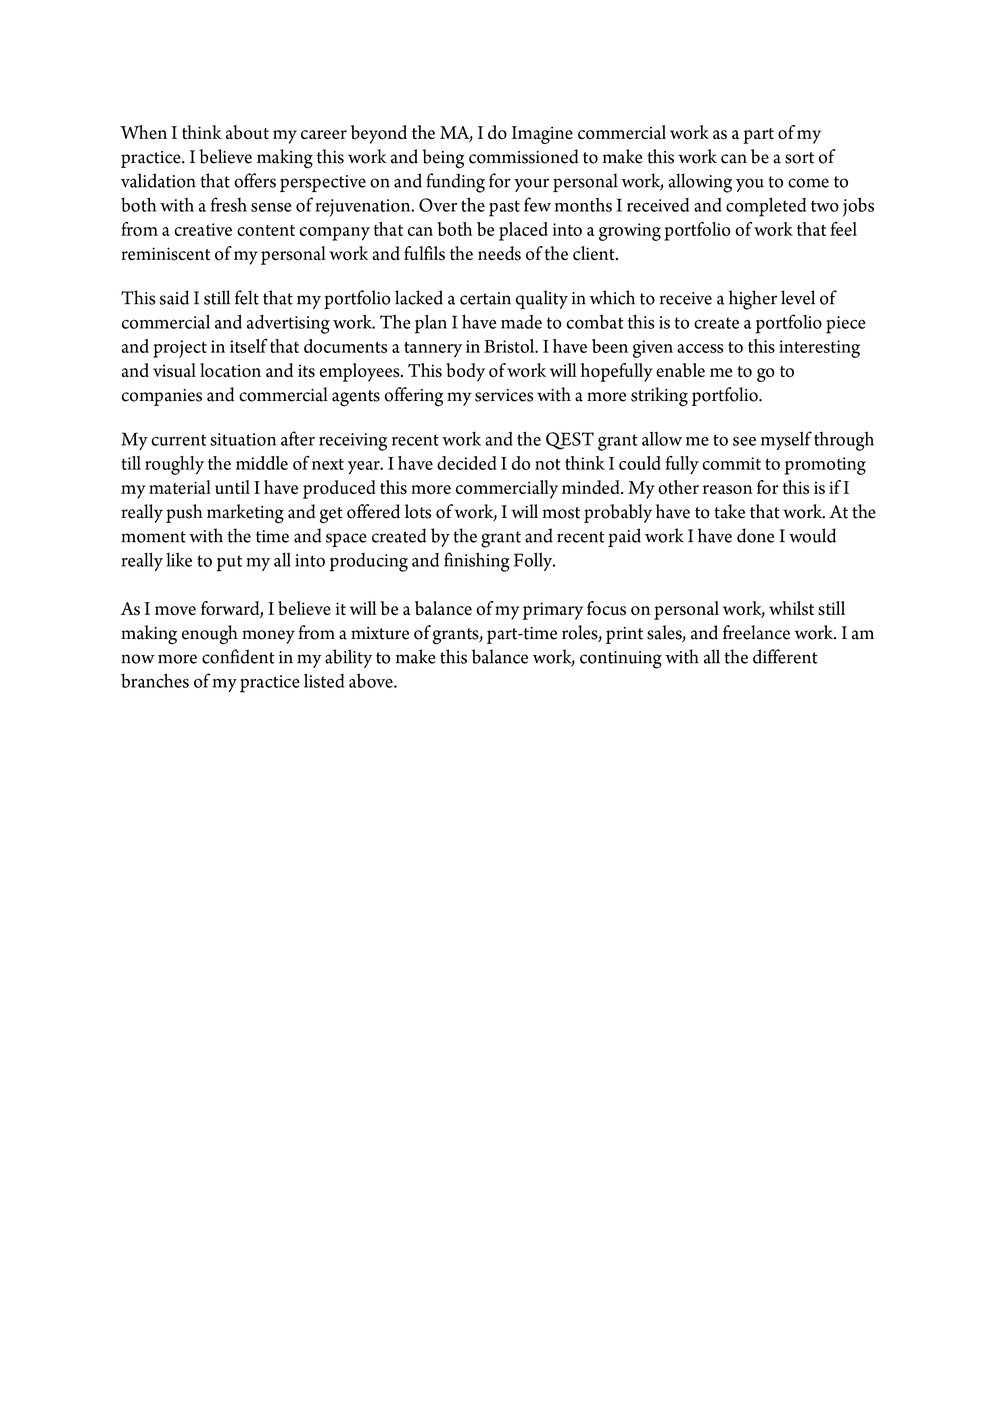 Evaluative Report - Jamie Murray-7.jpg